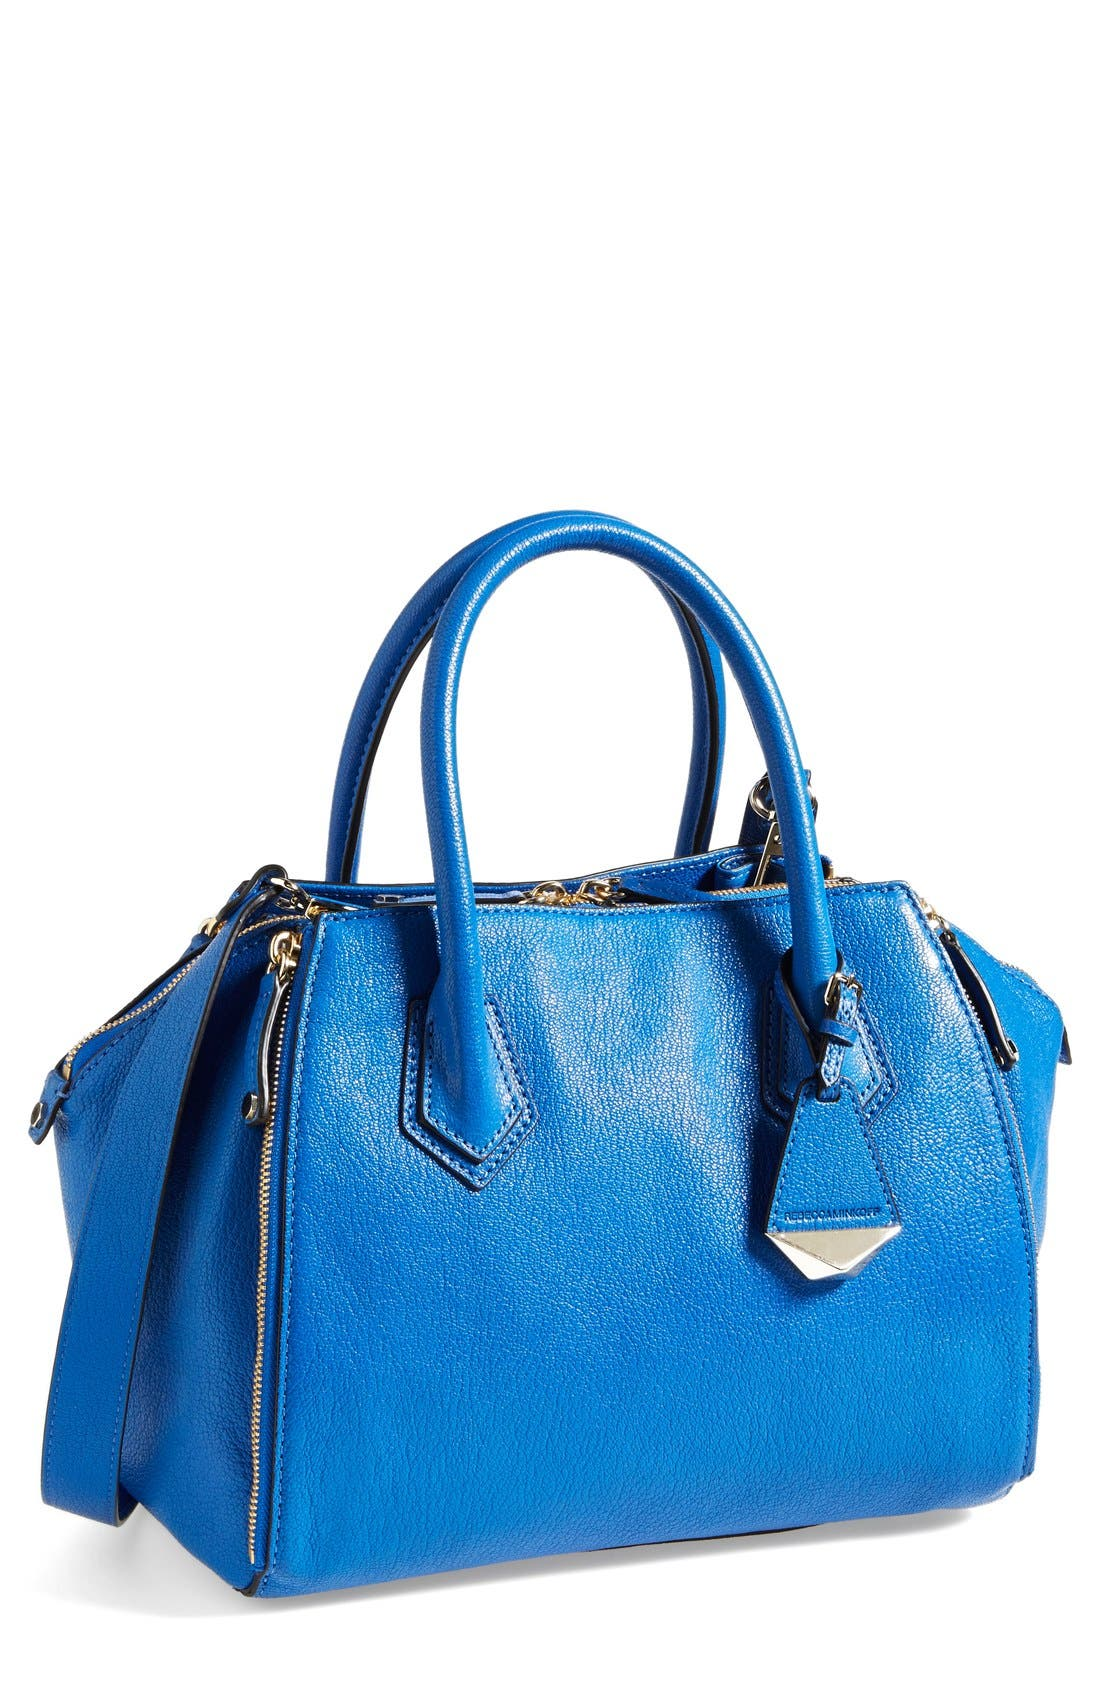 'Mini Perry' Satchel,                         Main,                         color, Bright Blue